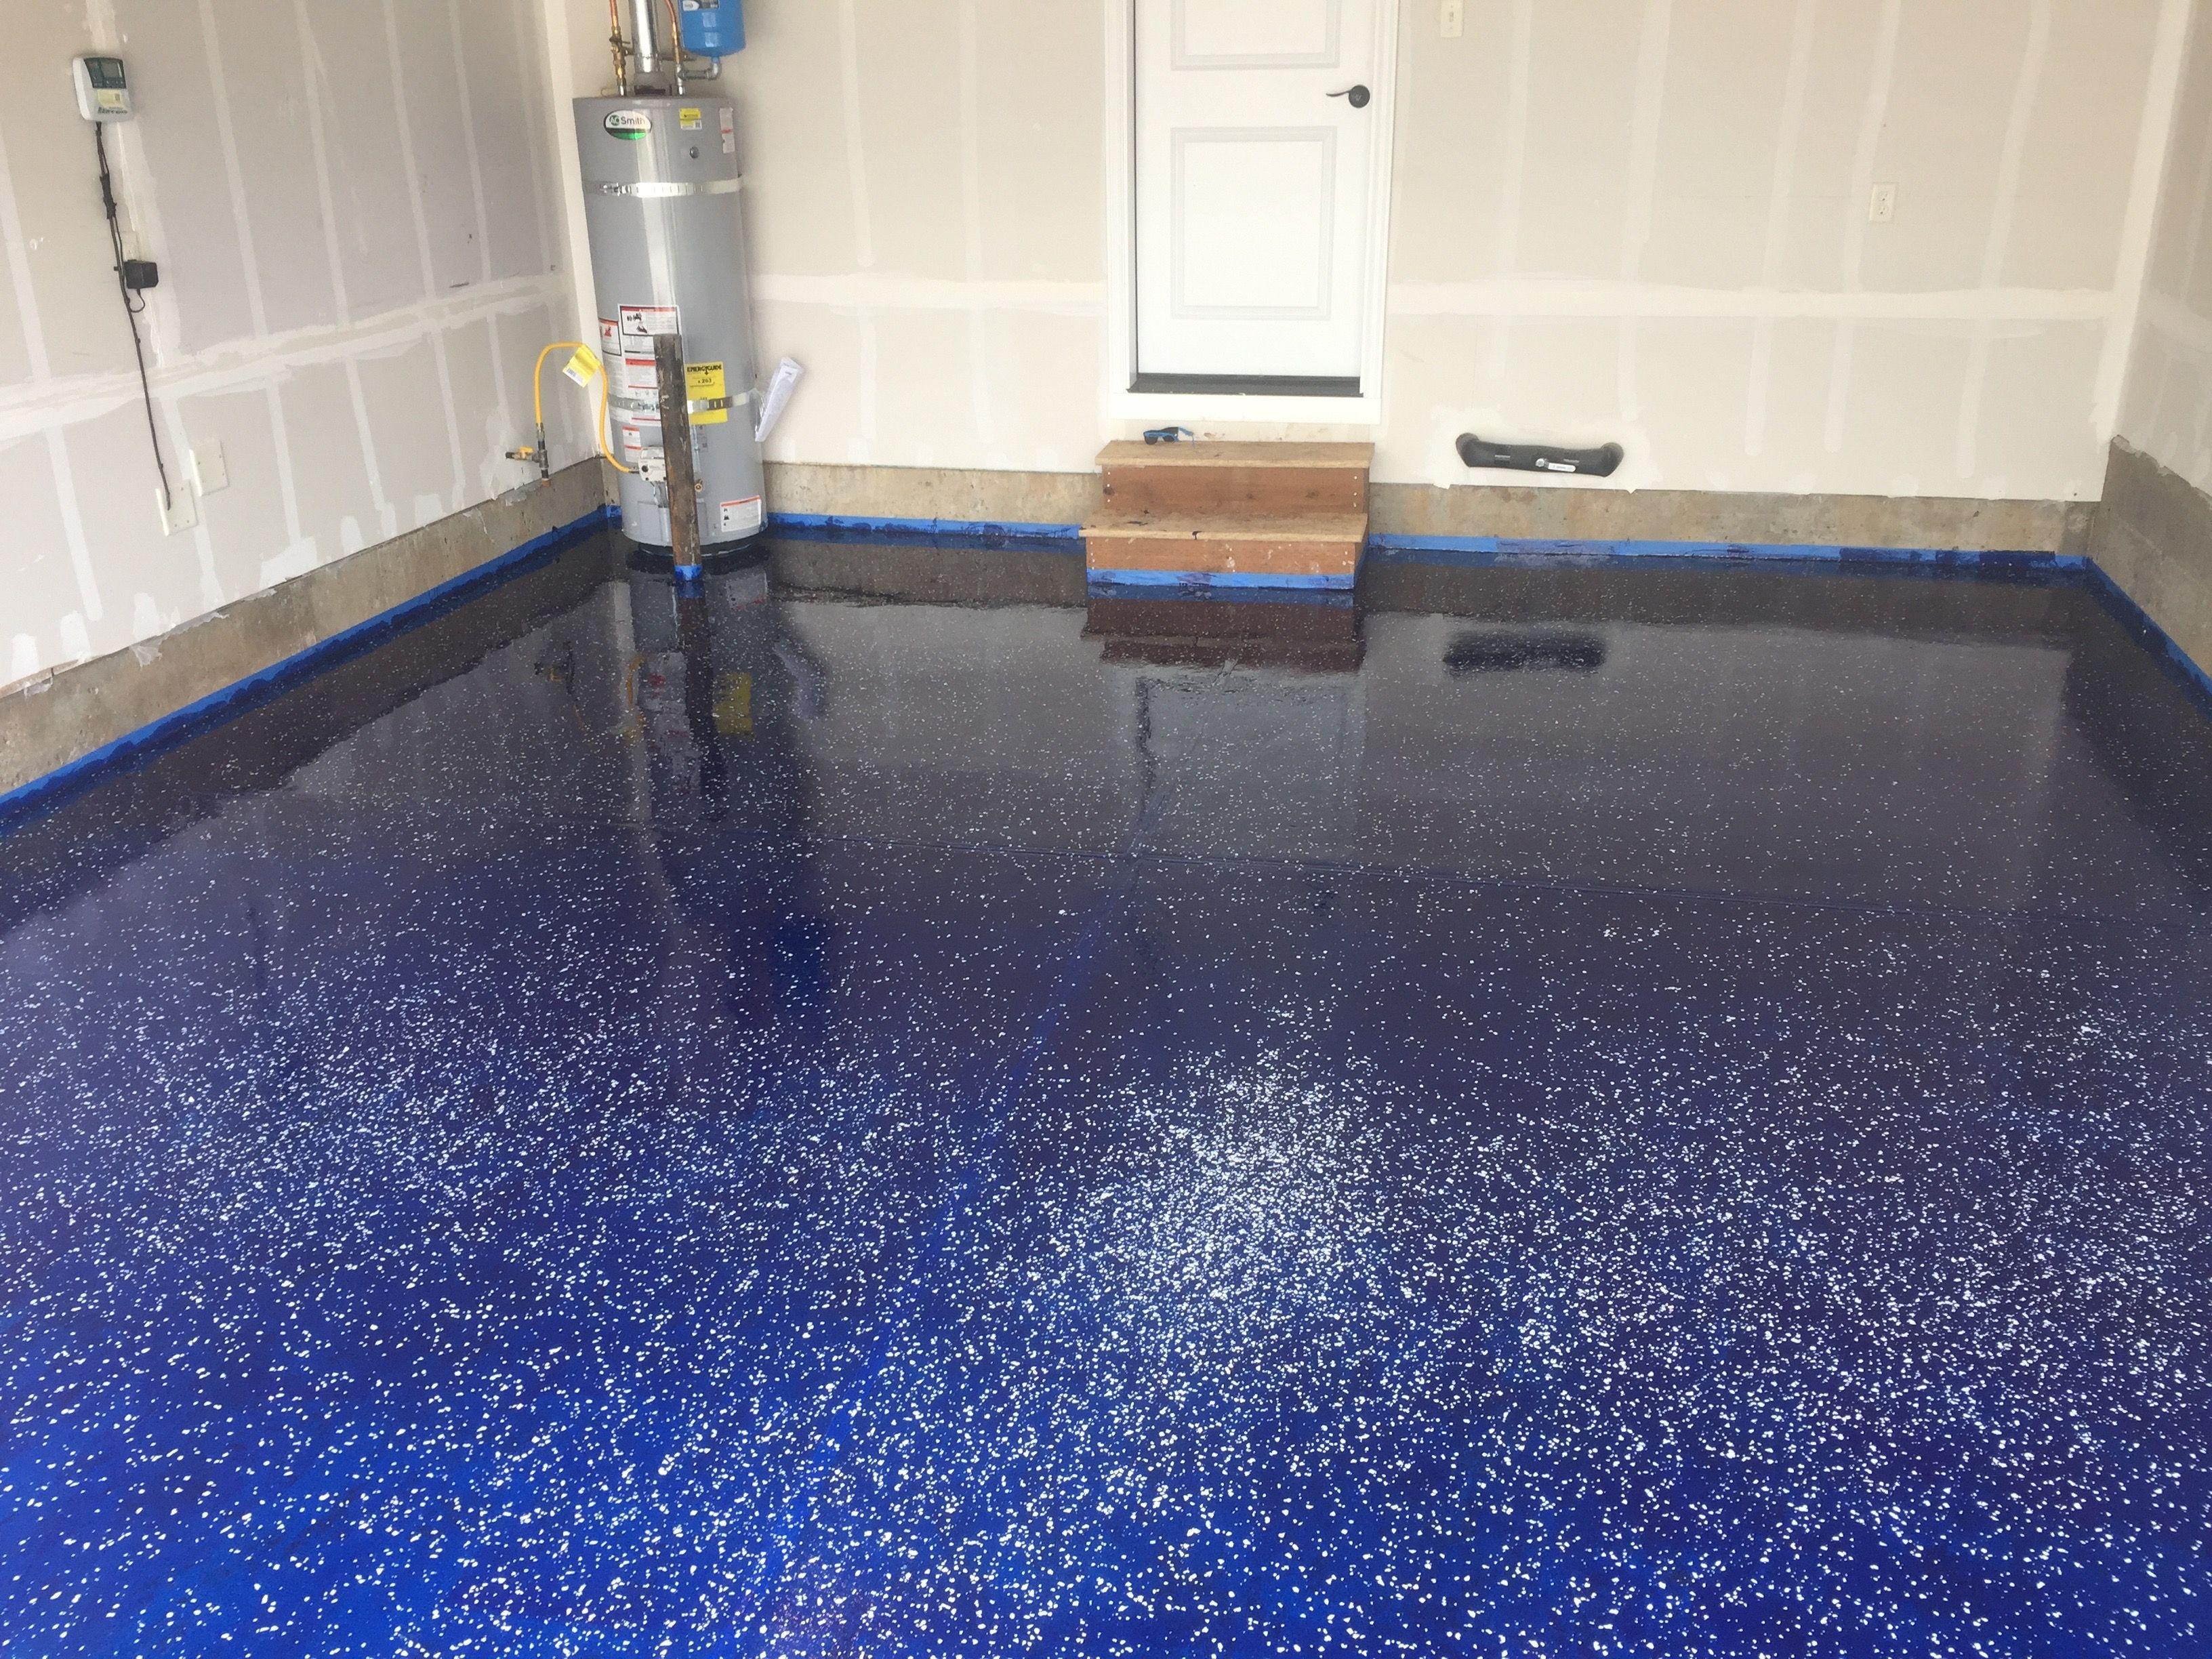 Epoxy Coated My Garage Floor Imgur Garage Epoxy Garage Floor Garage Floor Epoxy